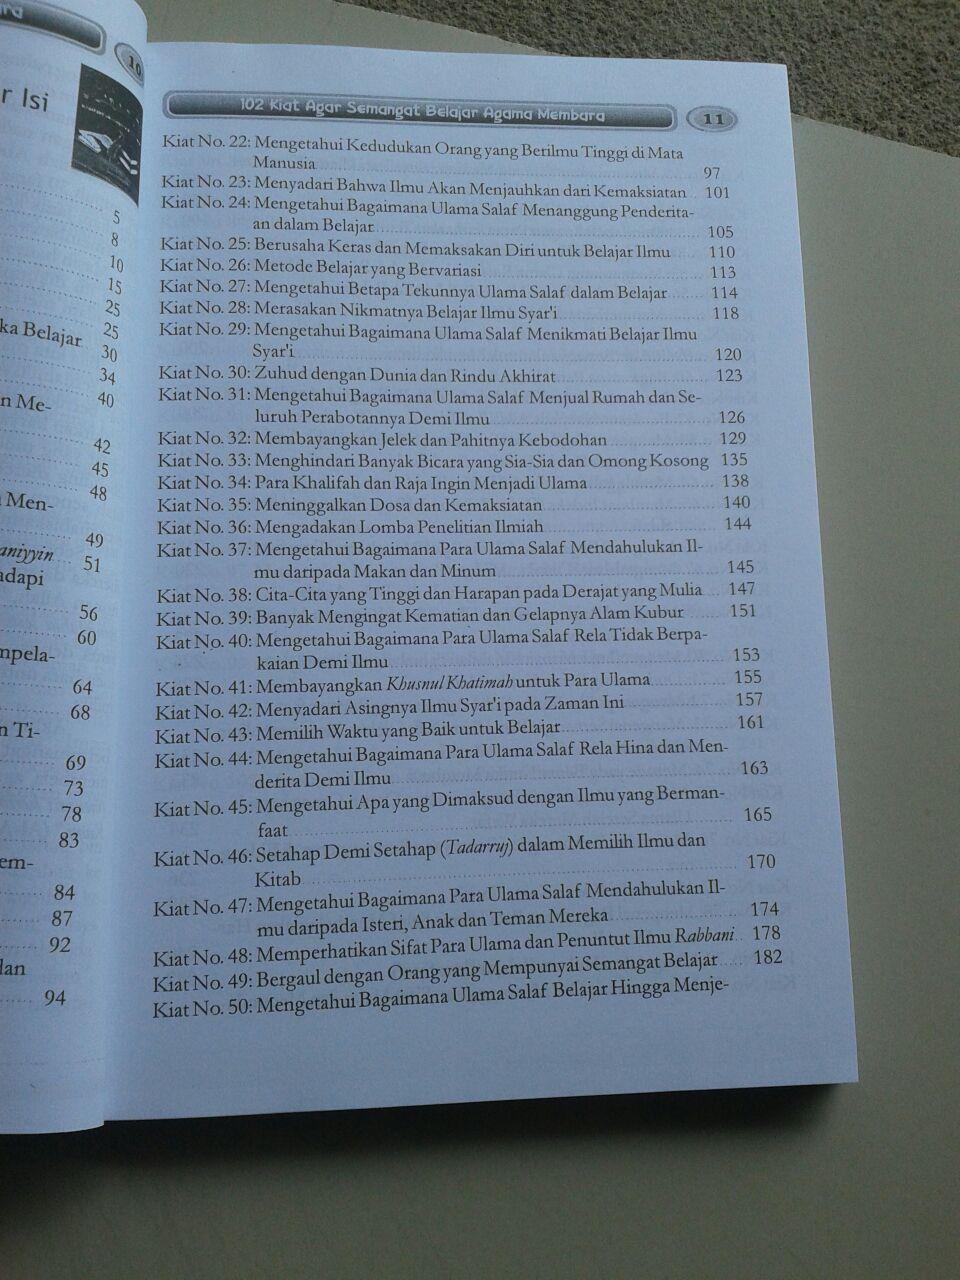 Buku 102 Kiat Agar Semangat Belajar Agama Membara isi 2